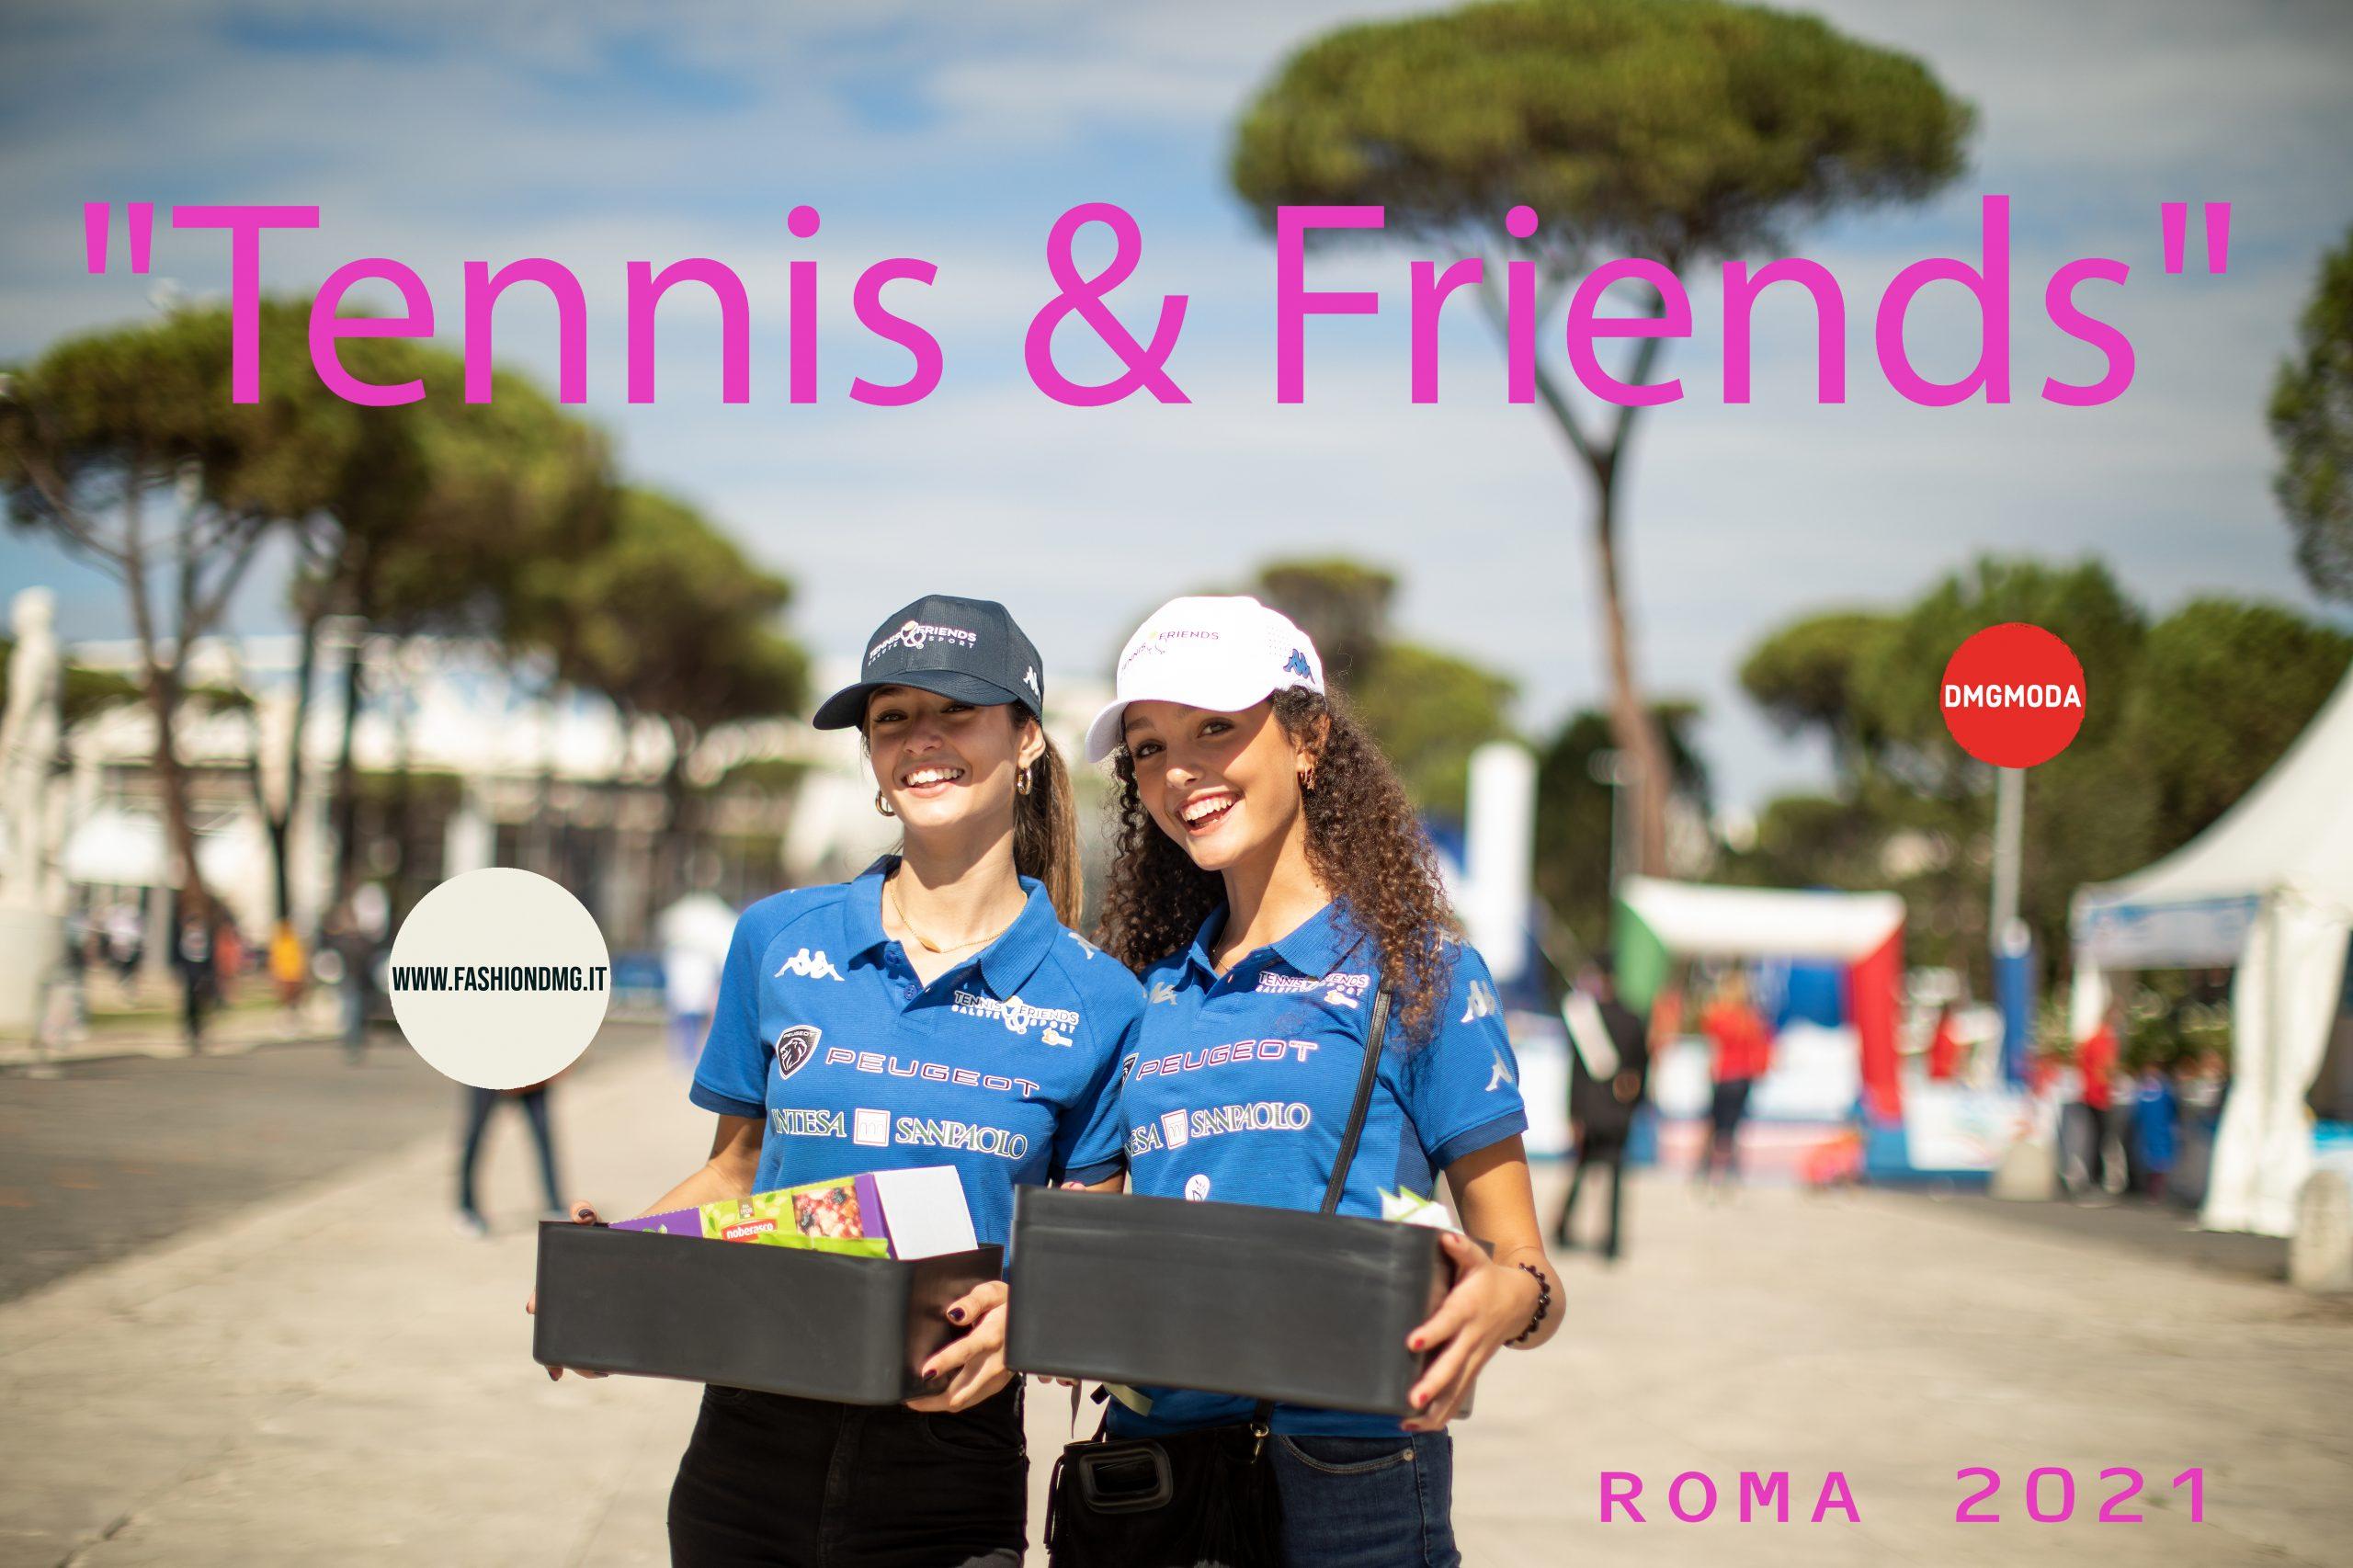 Tennis & Friends ROMA 2021 DMG